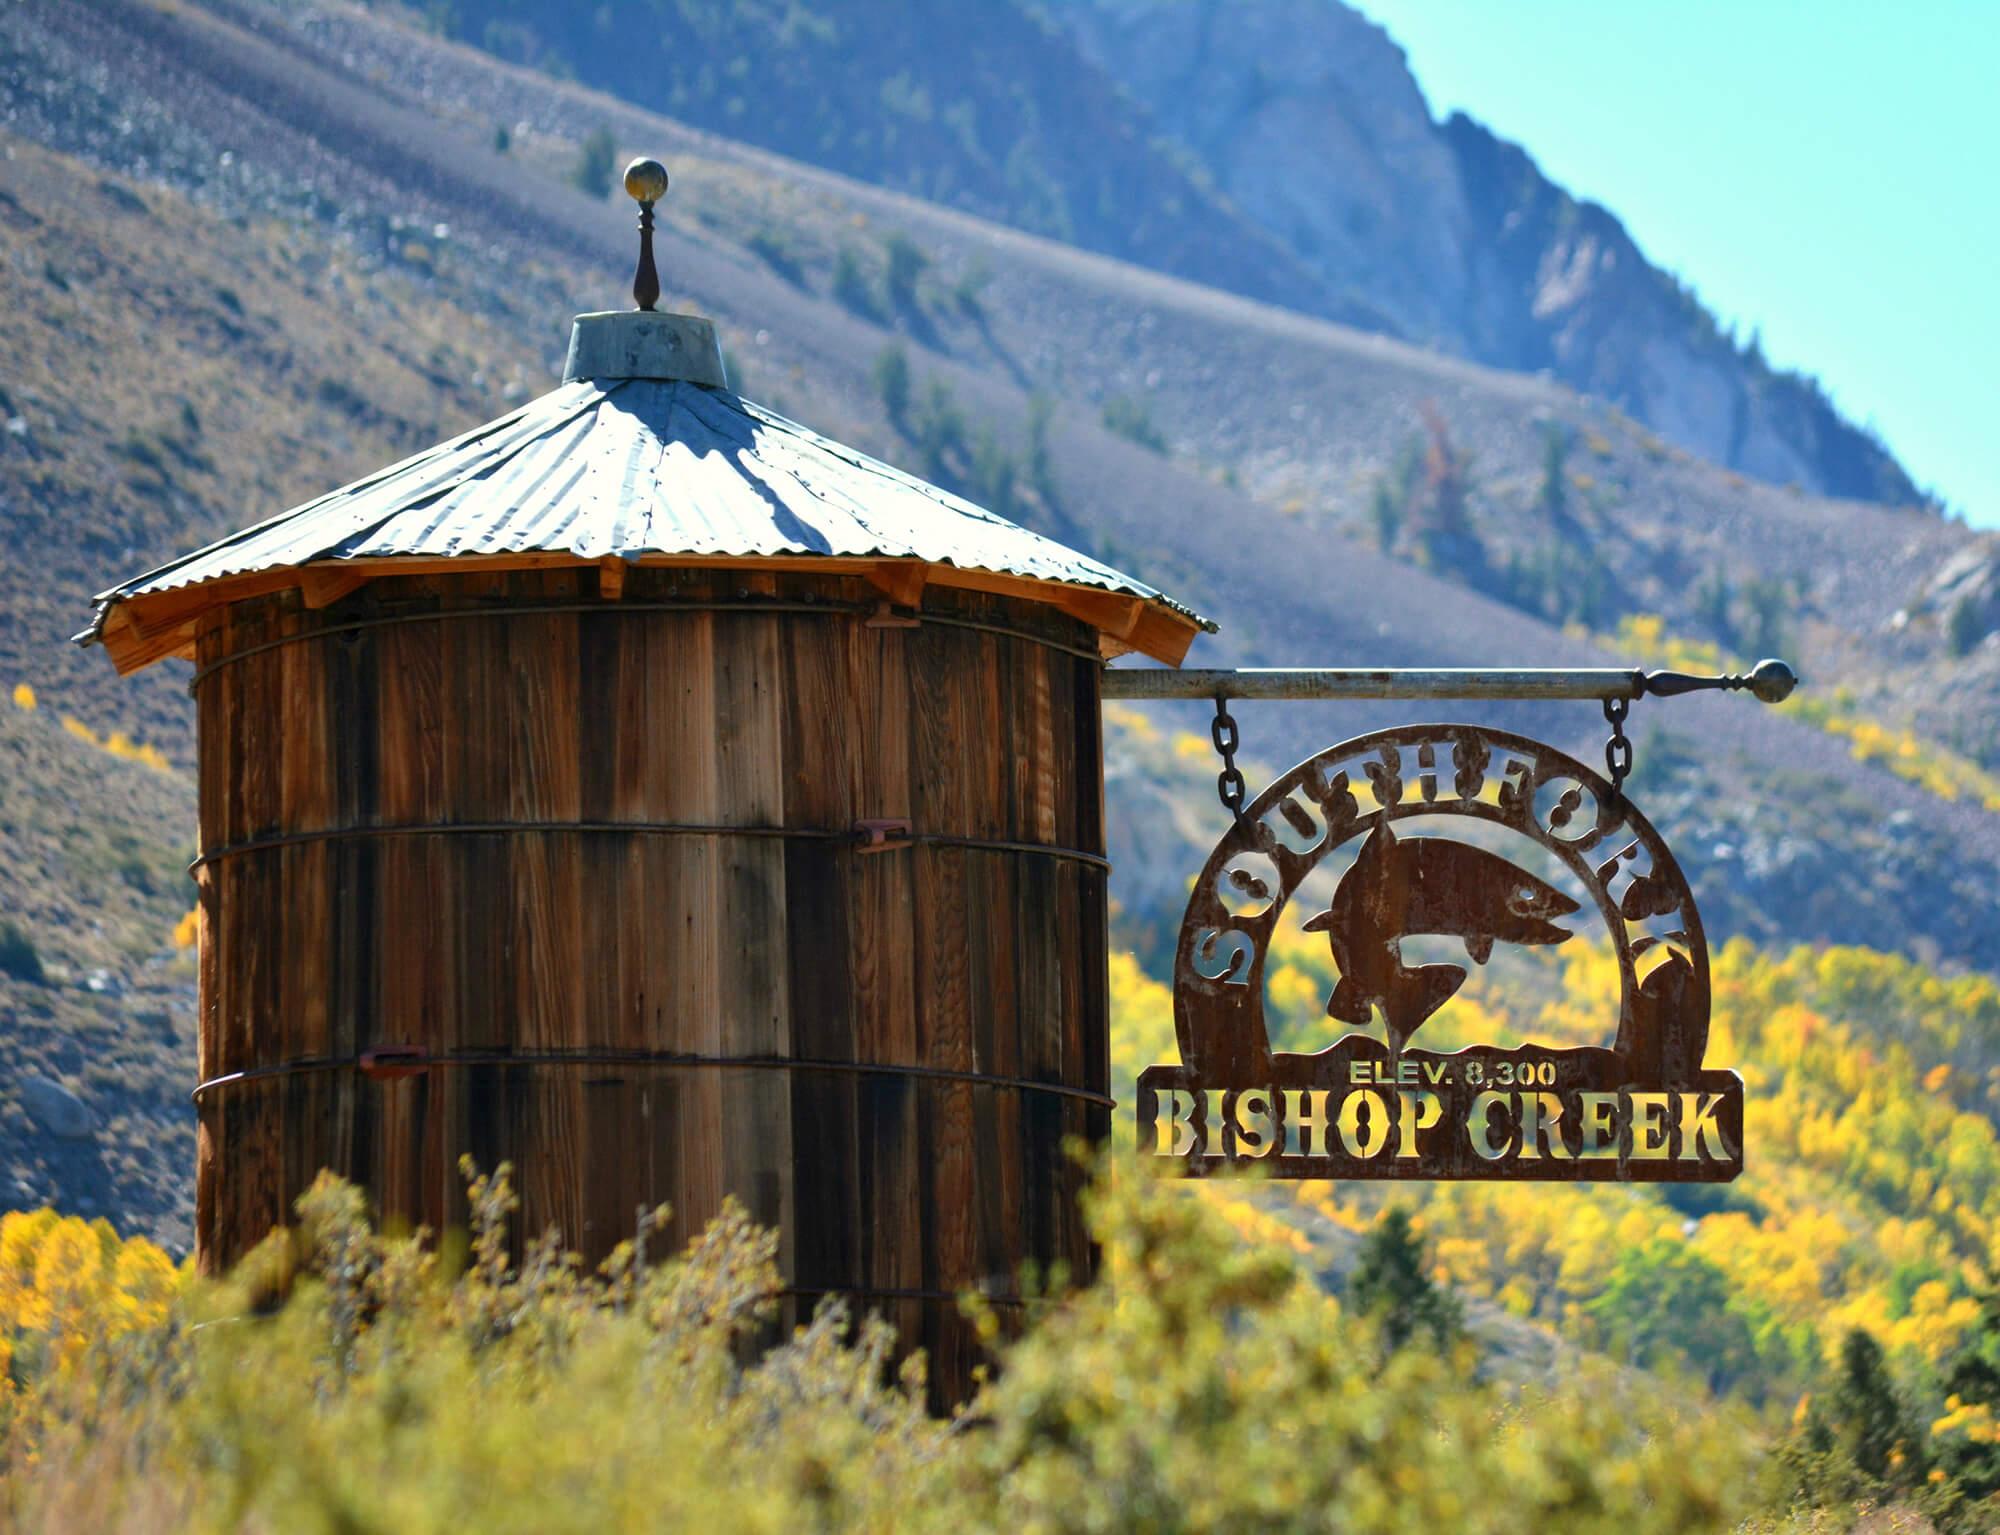 Bishop Creek Elevation 8300